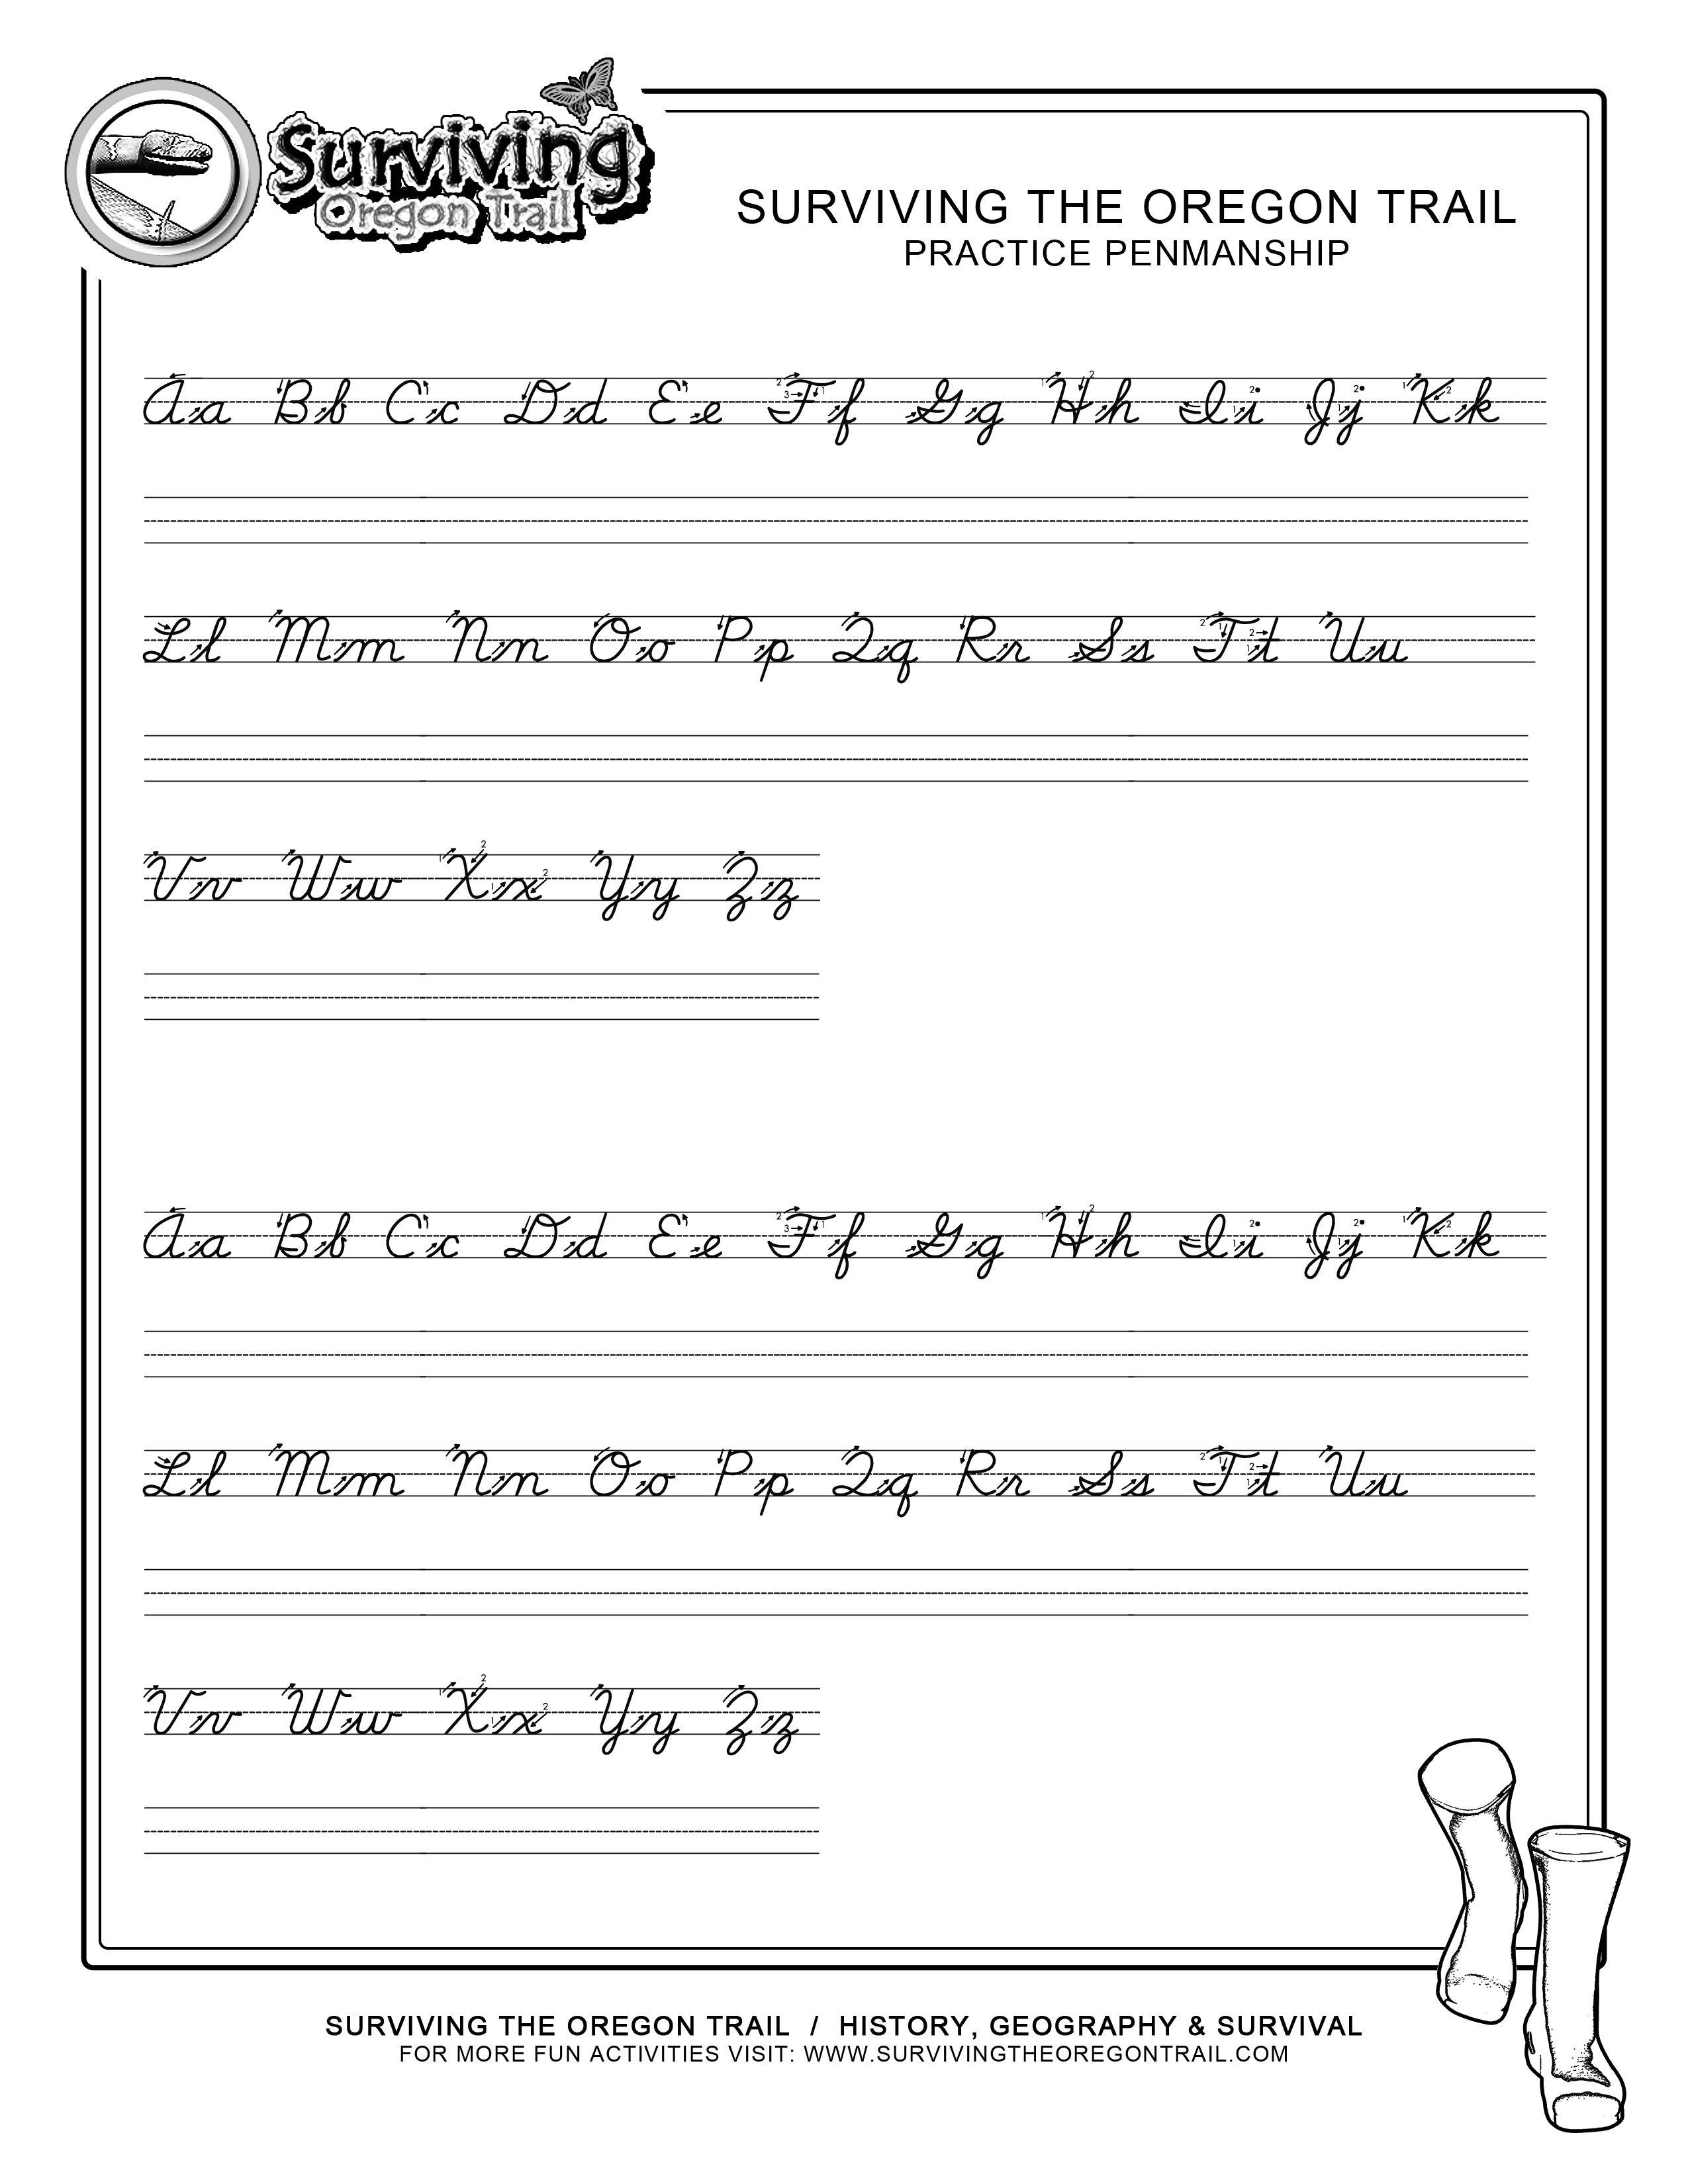 Practice Penmanship – Free Abc's Printable Cursive Writing Worksheet | Printable Penmanship Worksheets